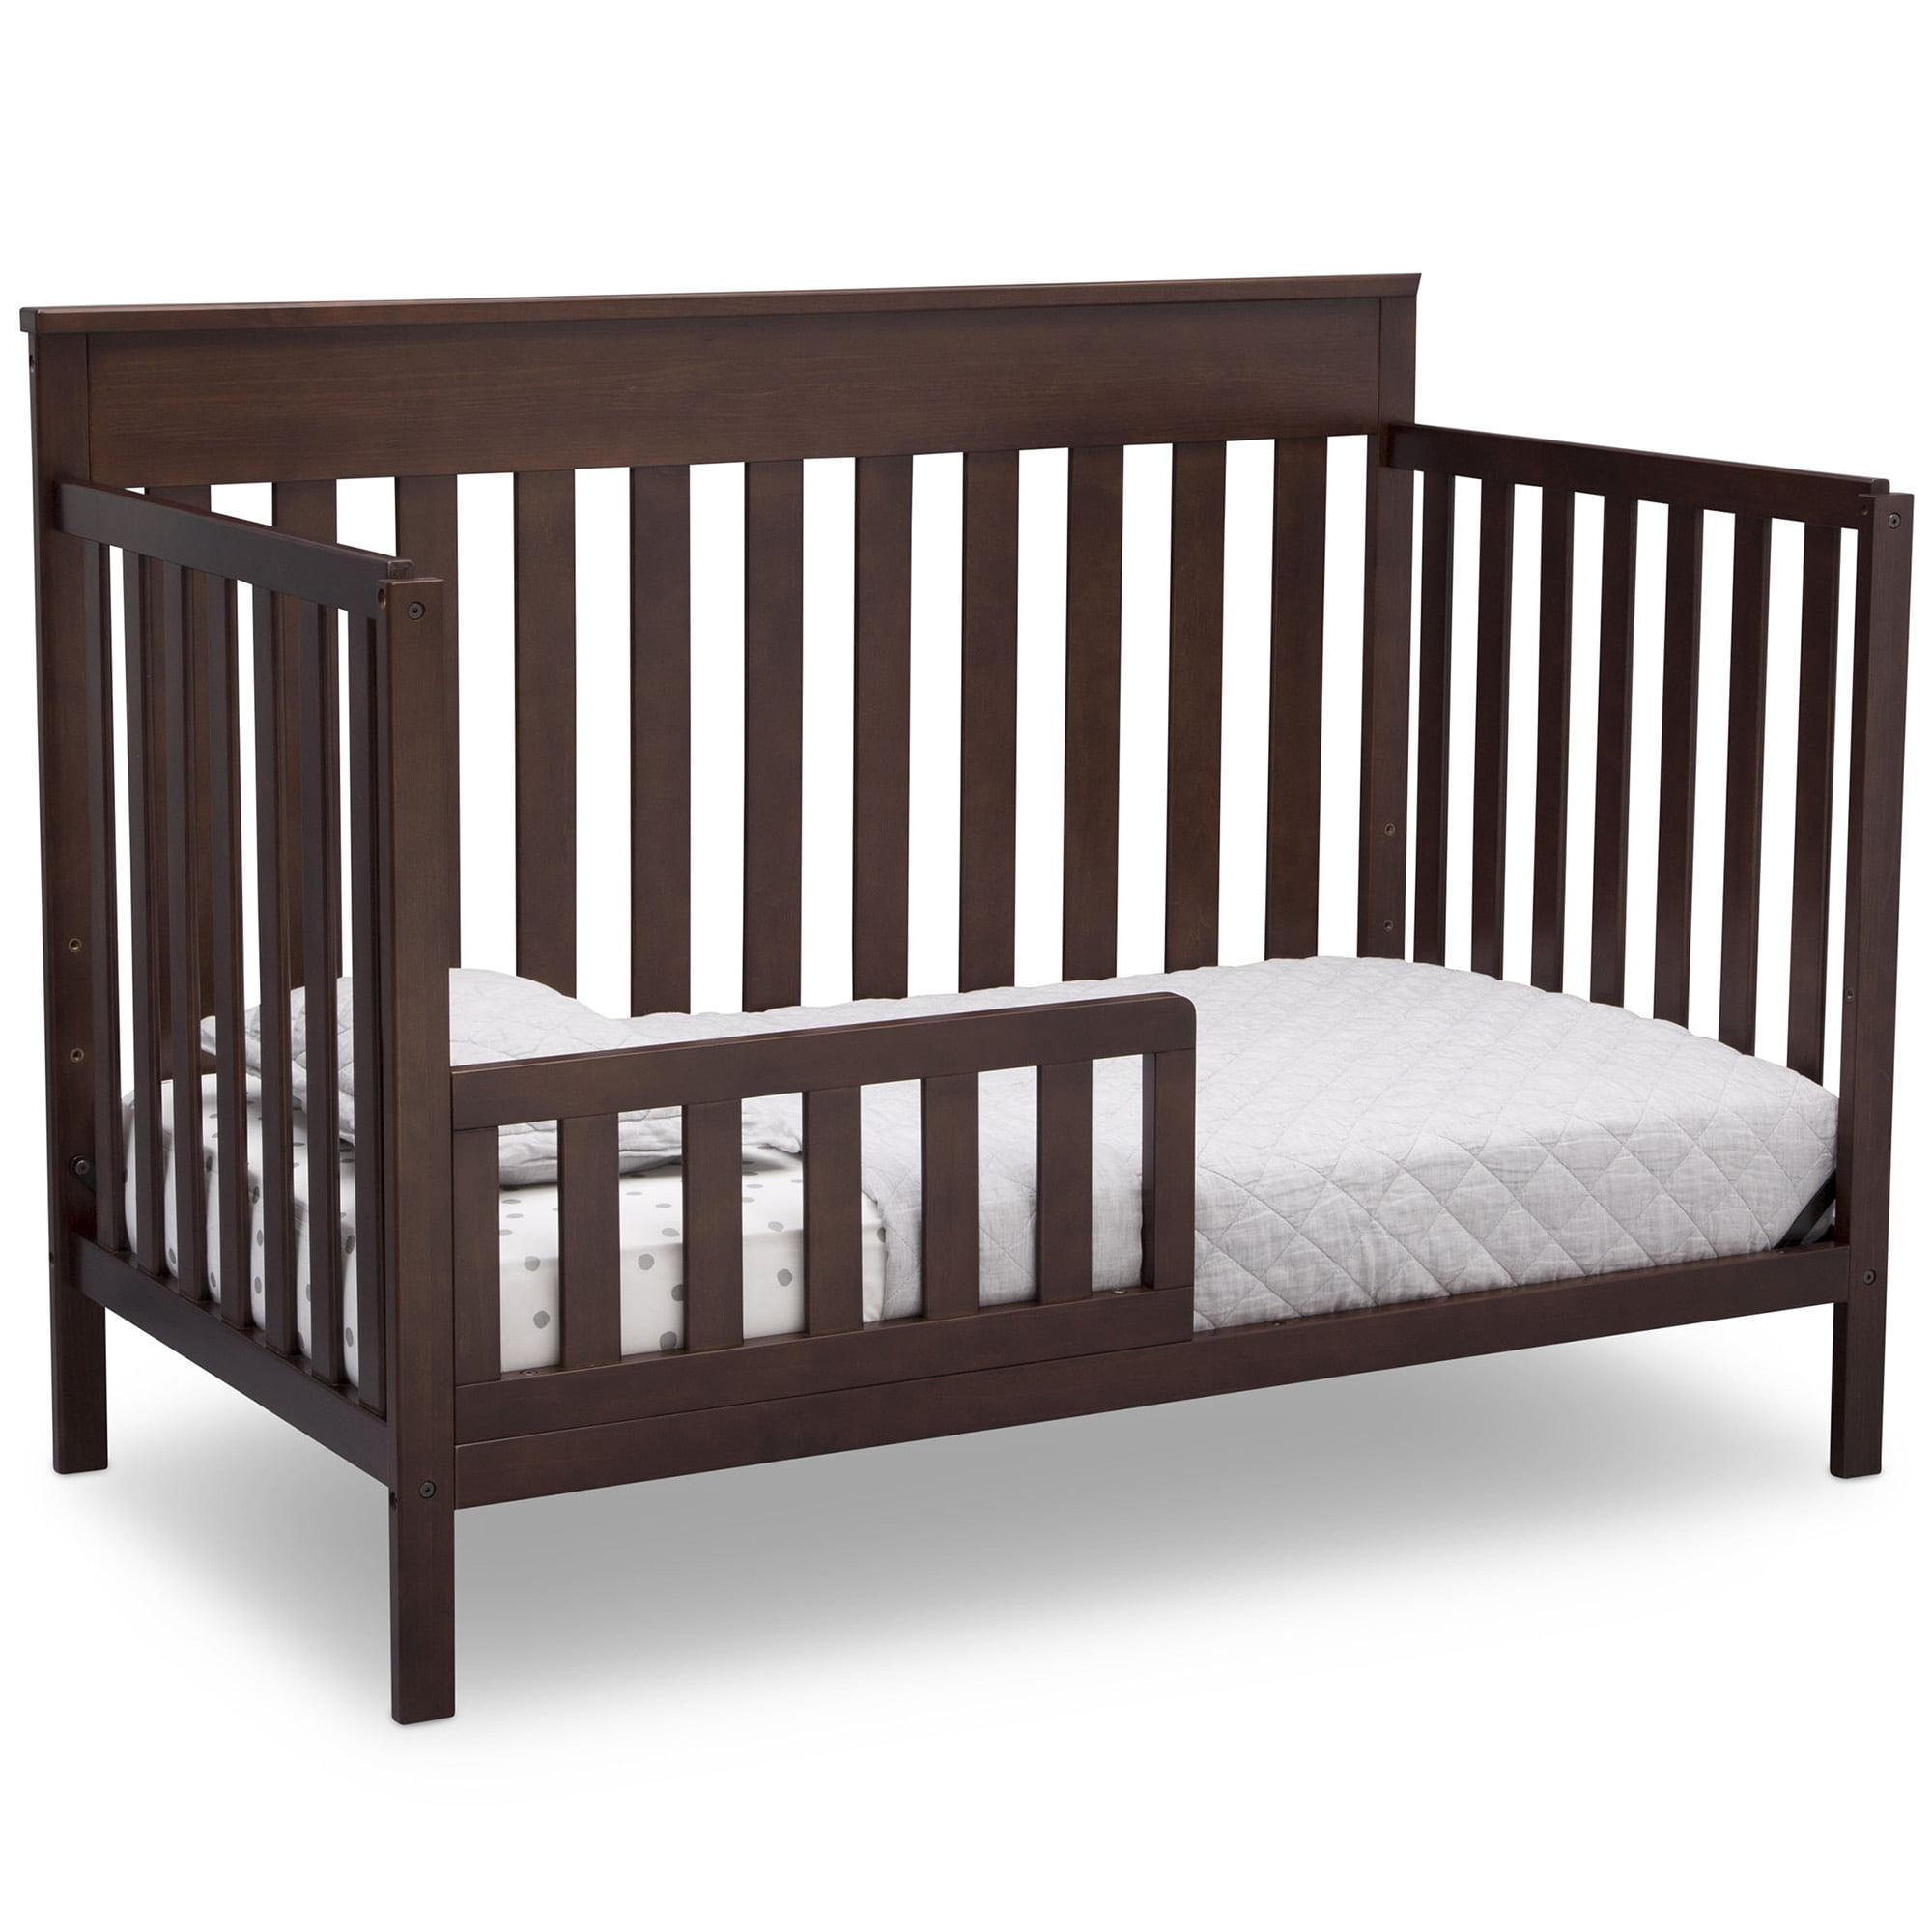 Delta Children Kingswood 4 In 1 Convertible Baby Crib Walnut Espresso Walmart Com Walmart Com